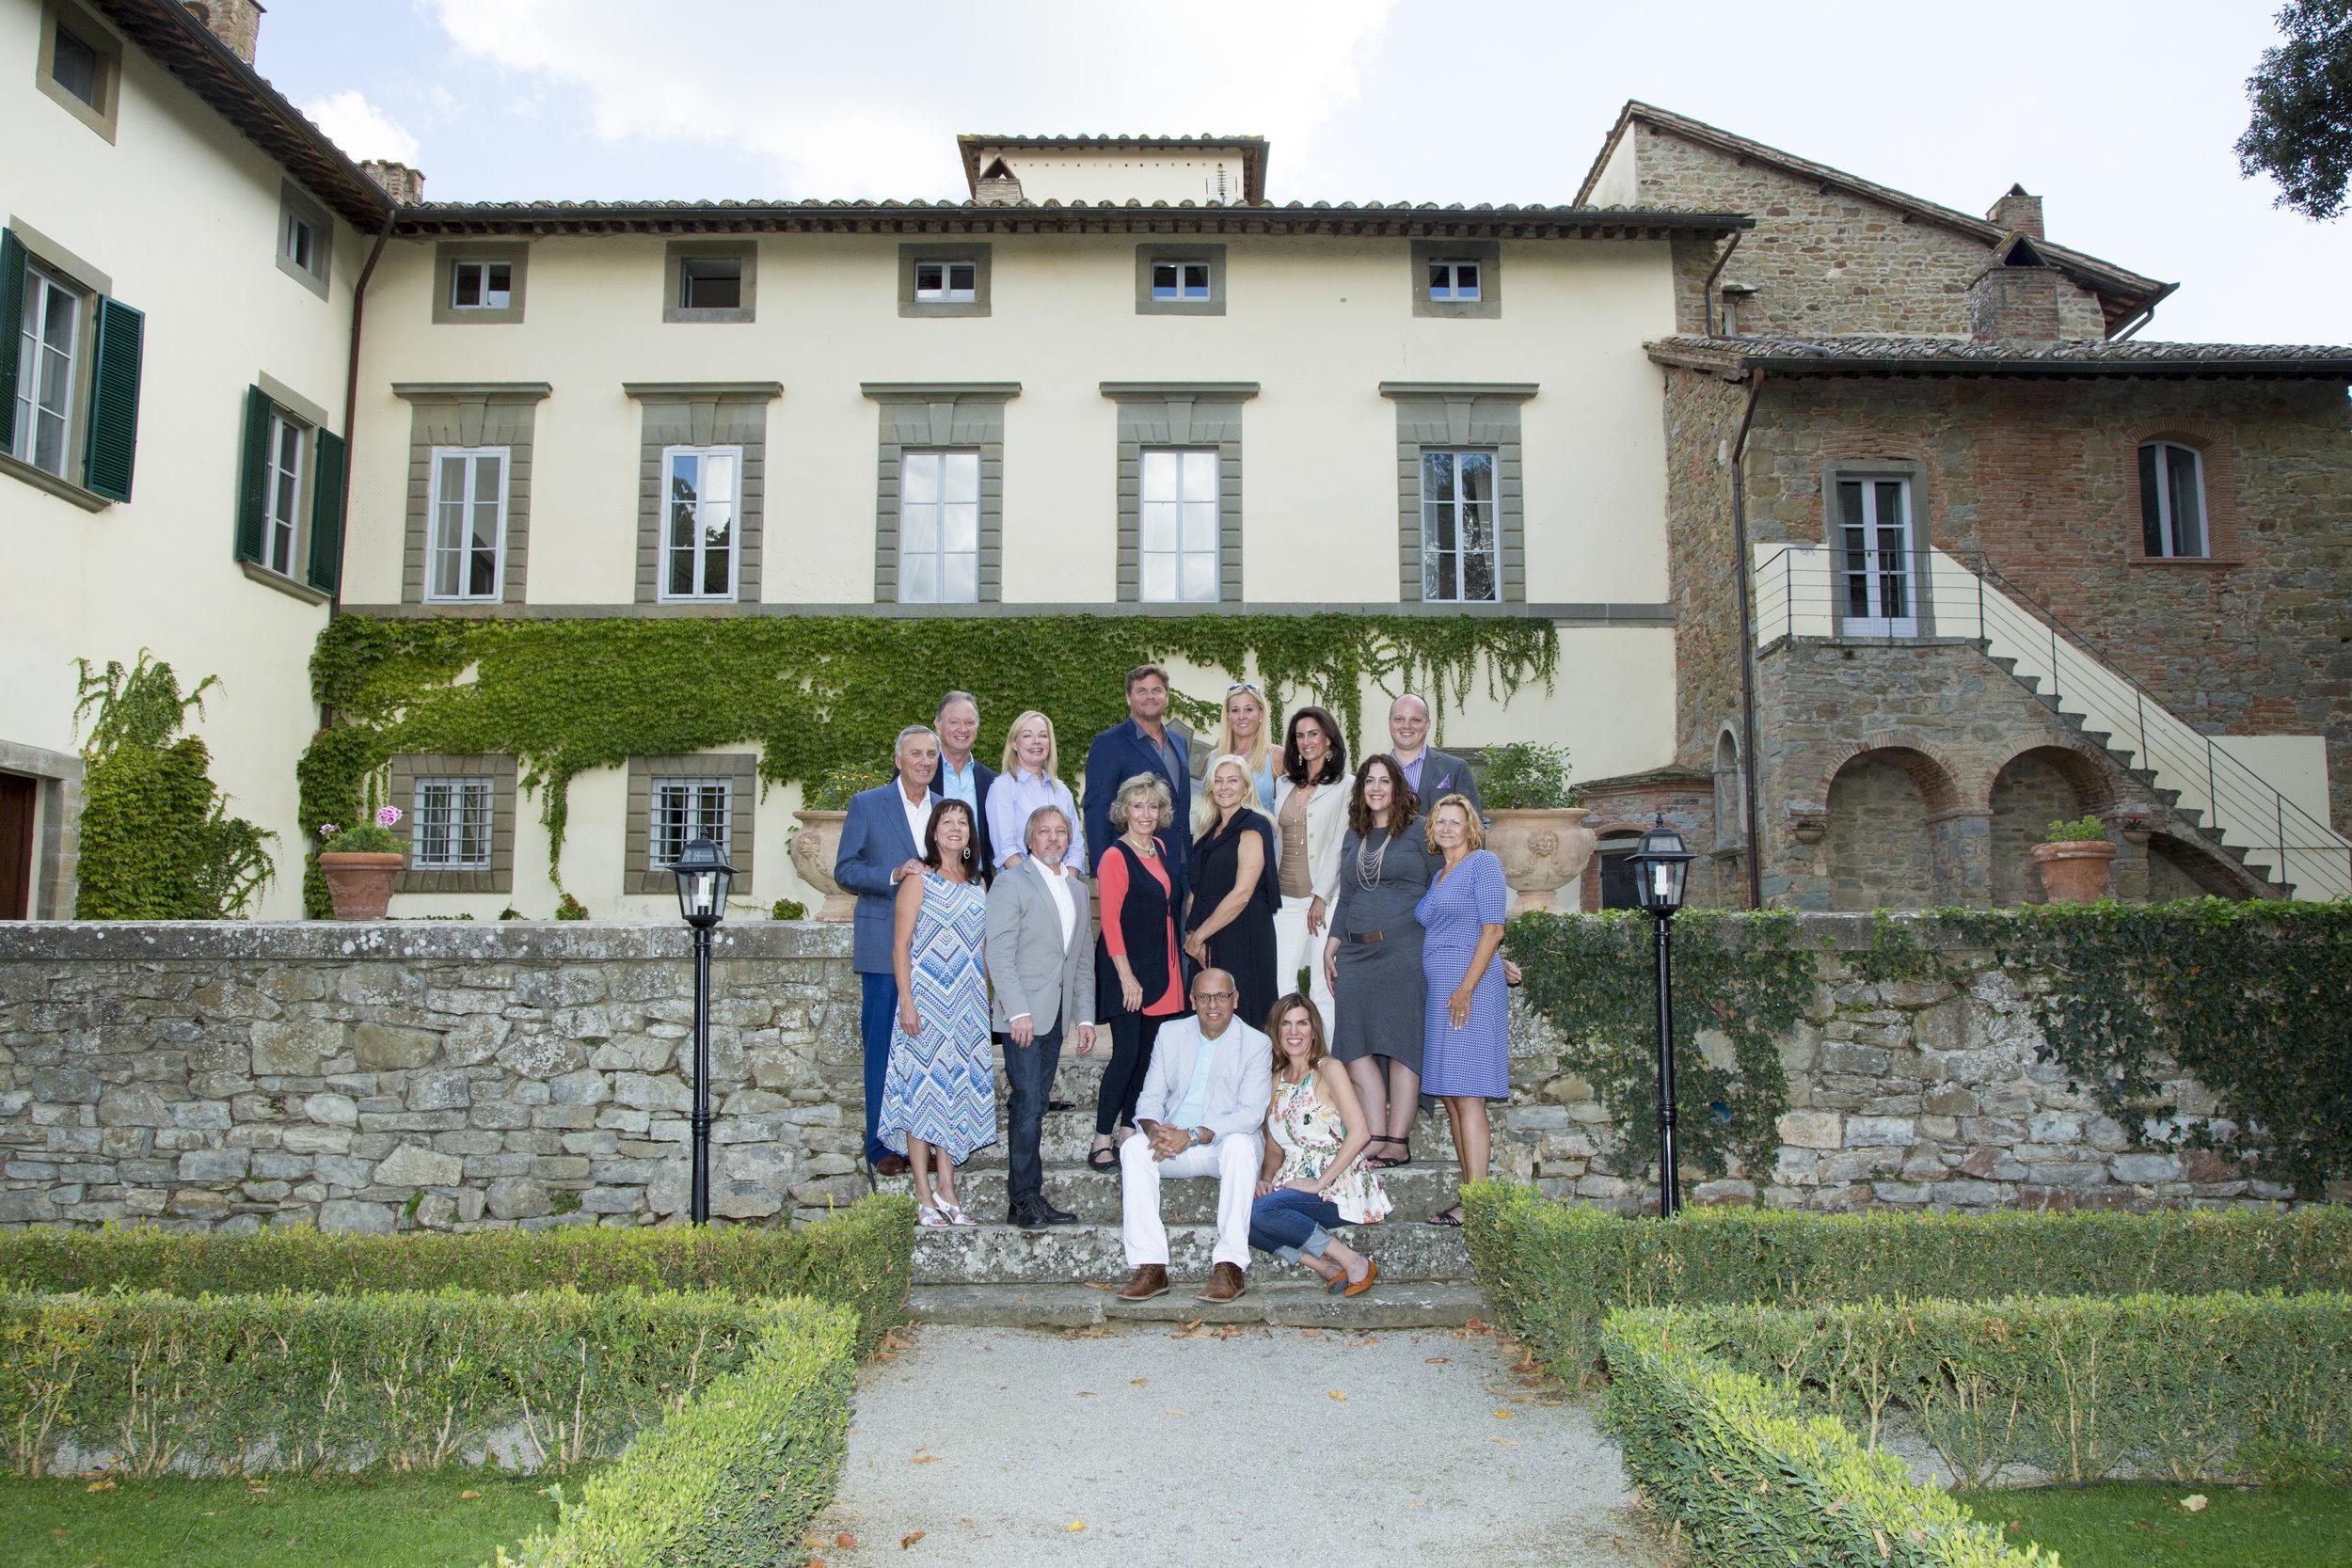 Our 2015 Candelaria Design Tour Italy at the Villa Piazzano